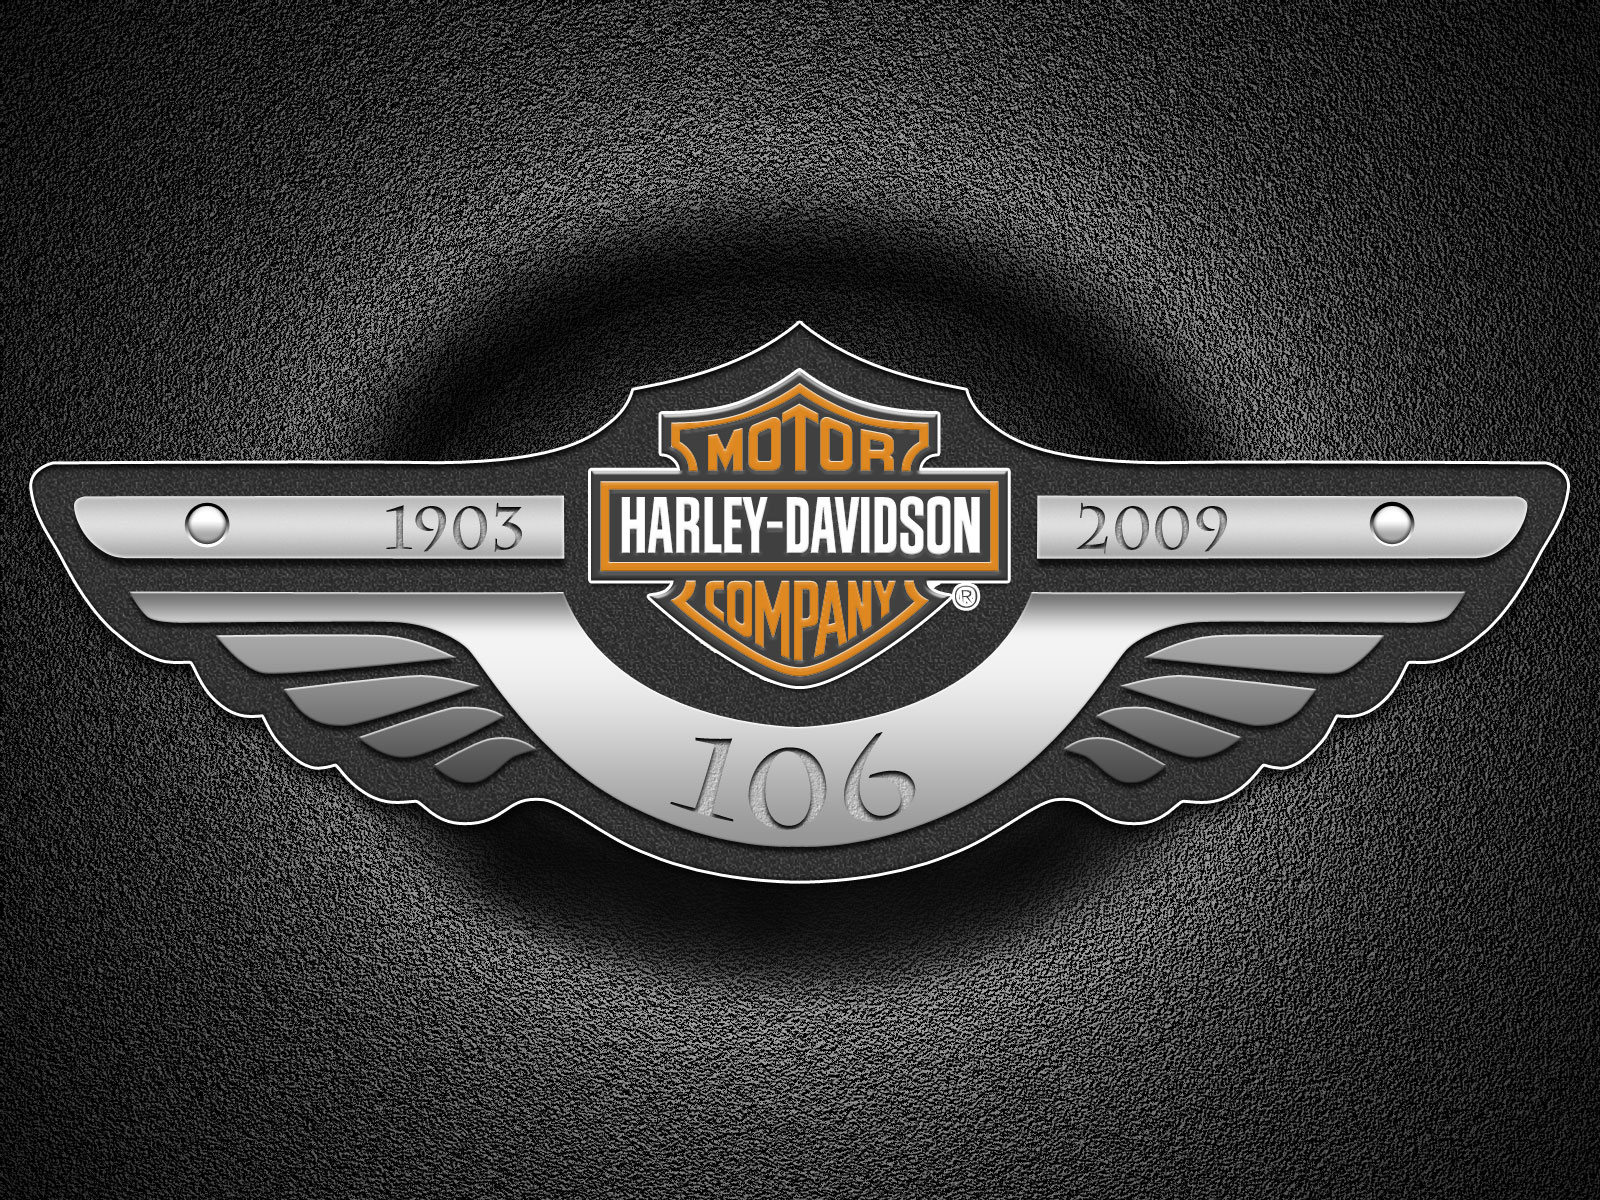 EL MUNDO AVATAR Willie G Davidson se retira de Harley Davidson 1600x1200